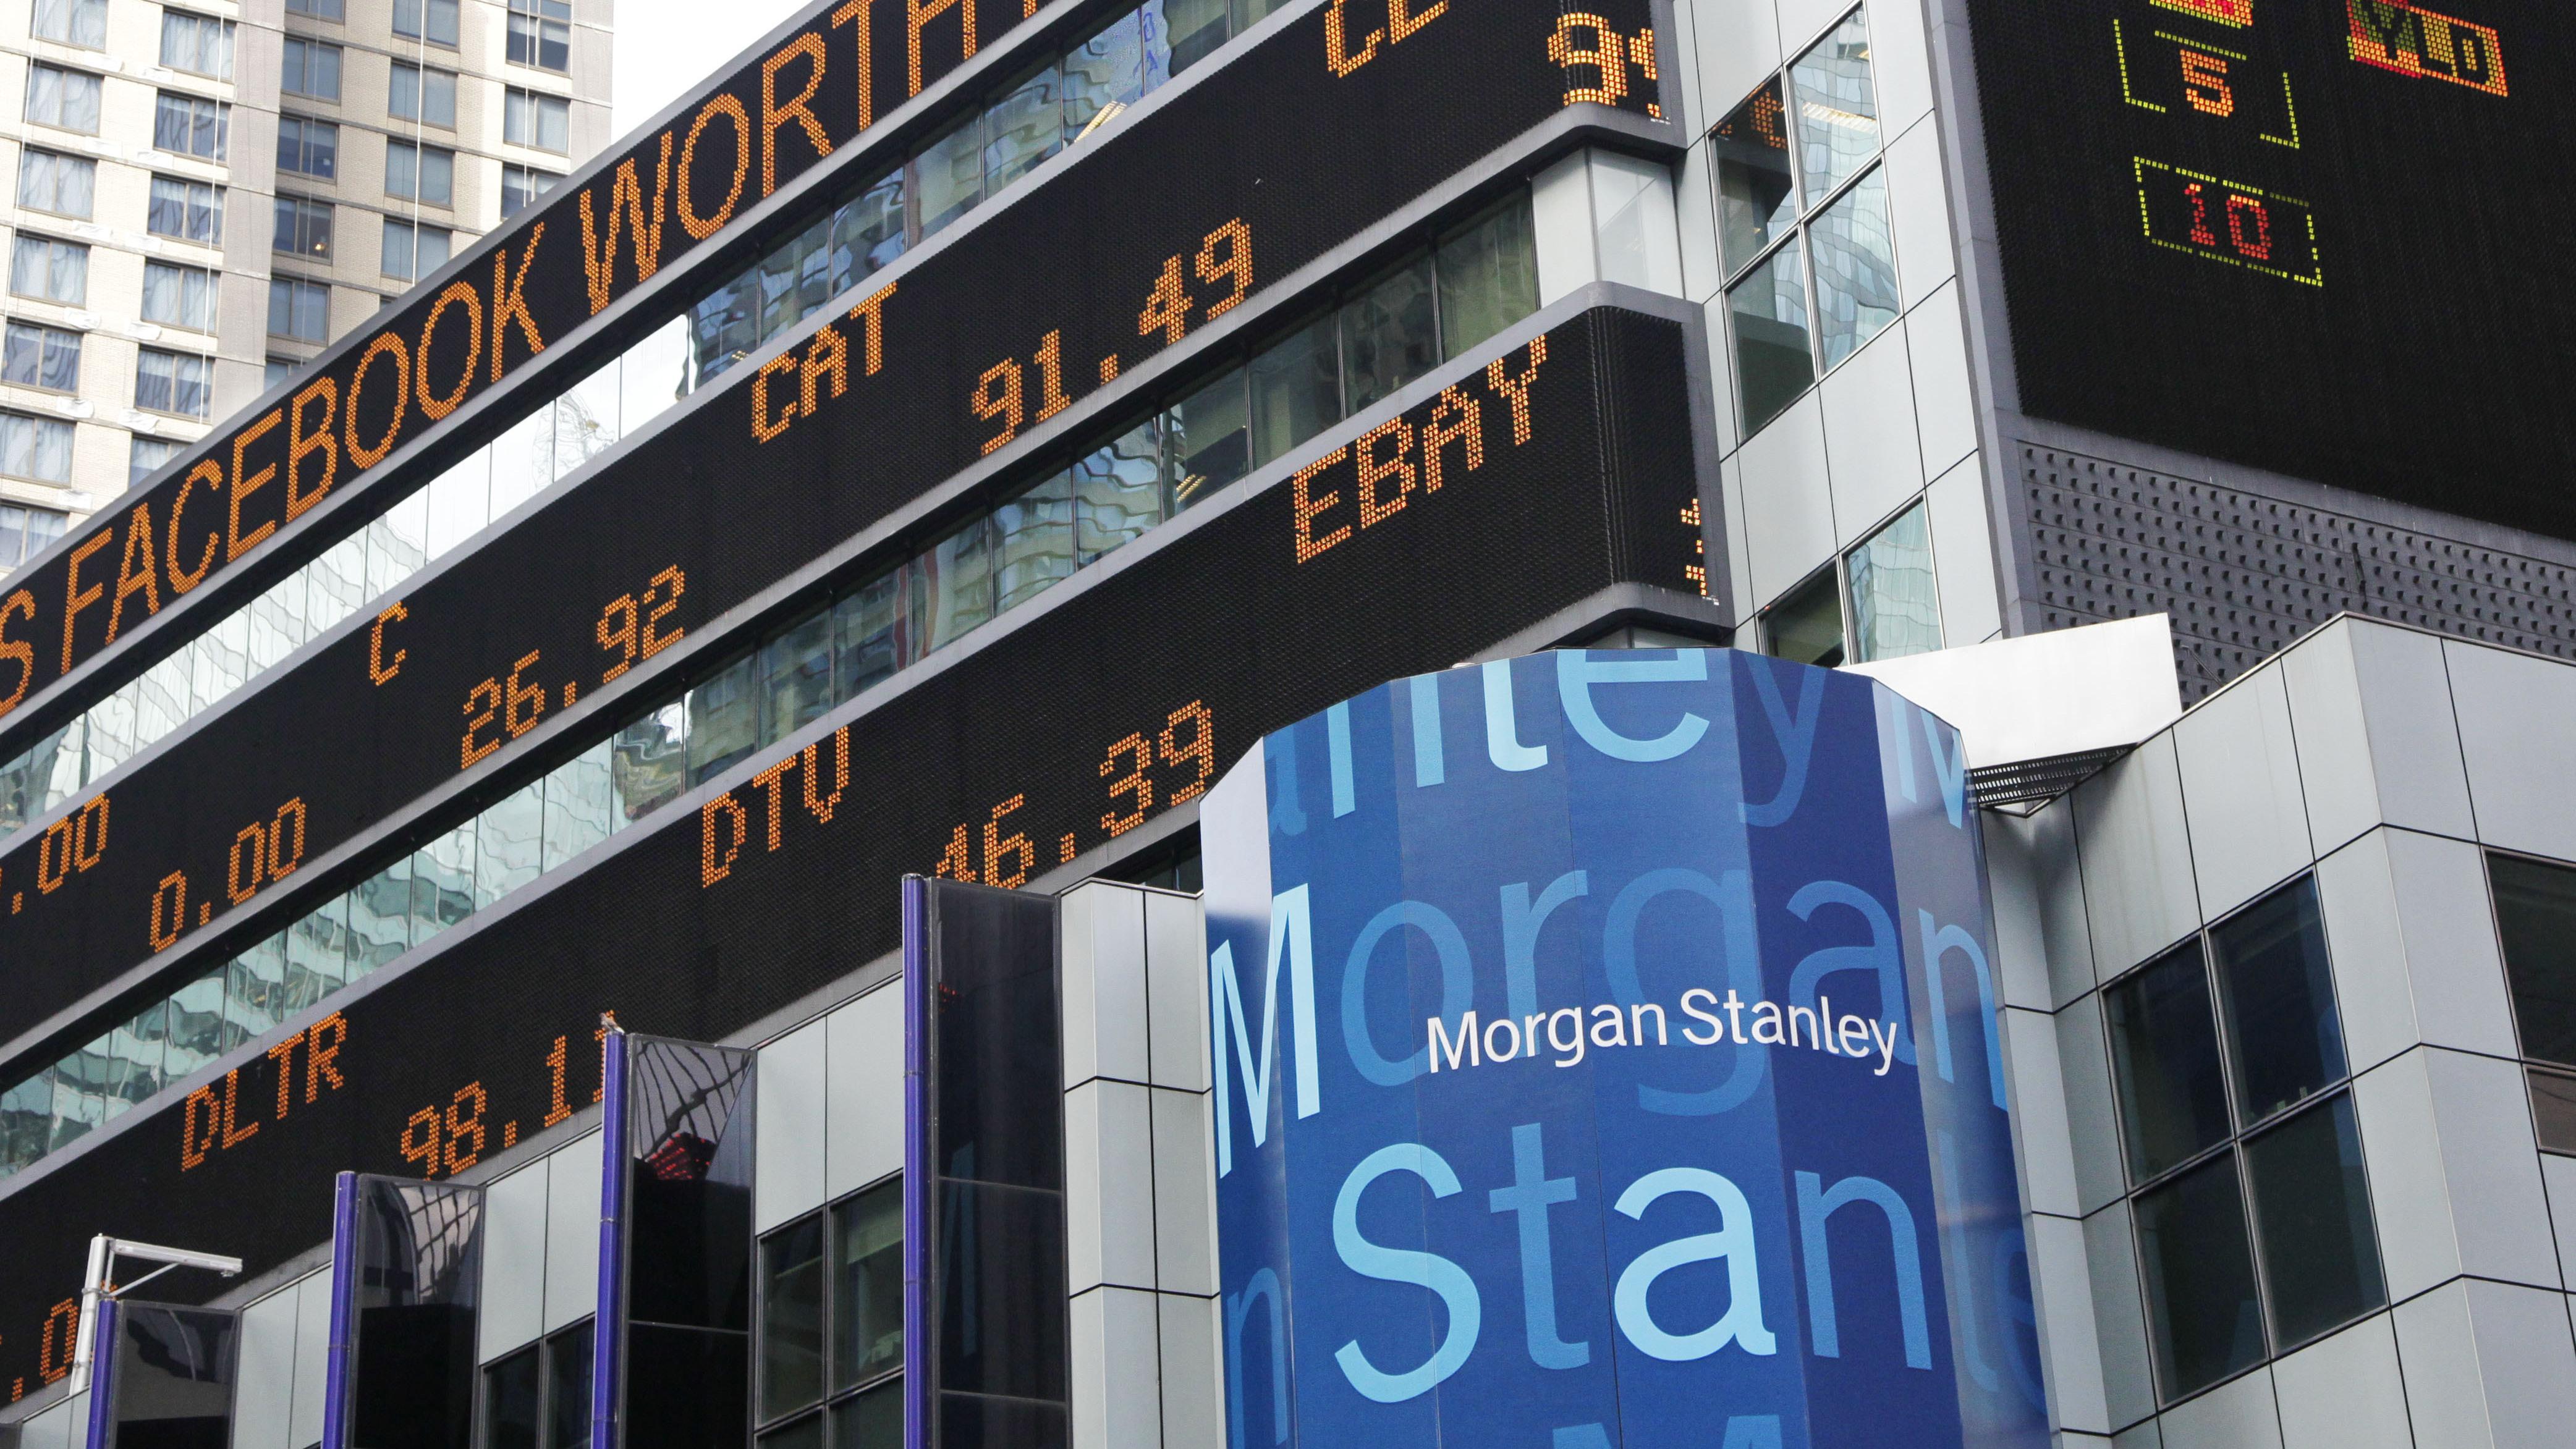 Morgan stanley latest ipo deals